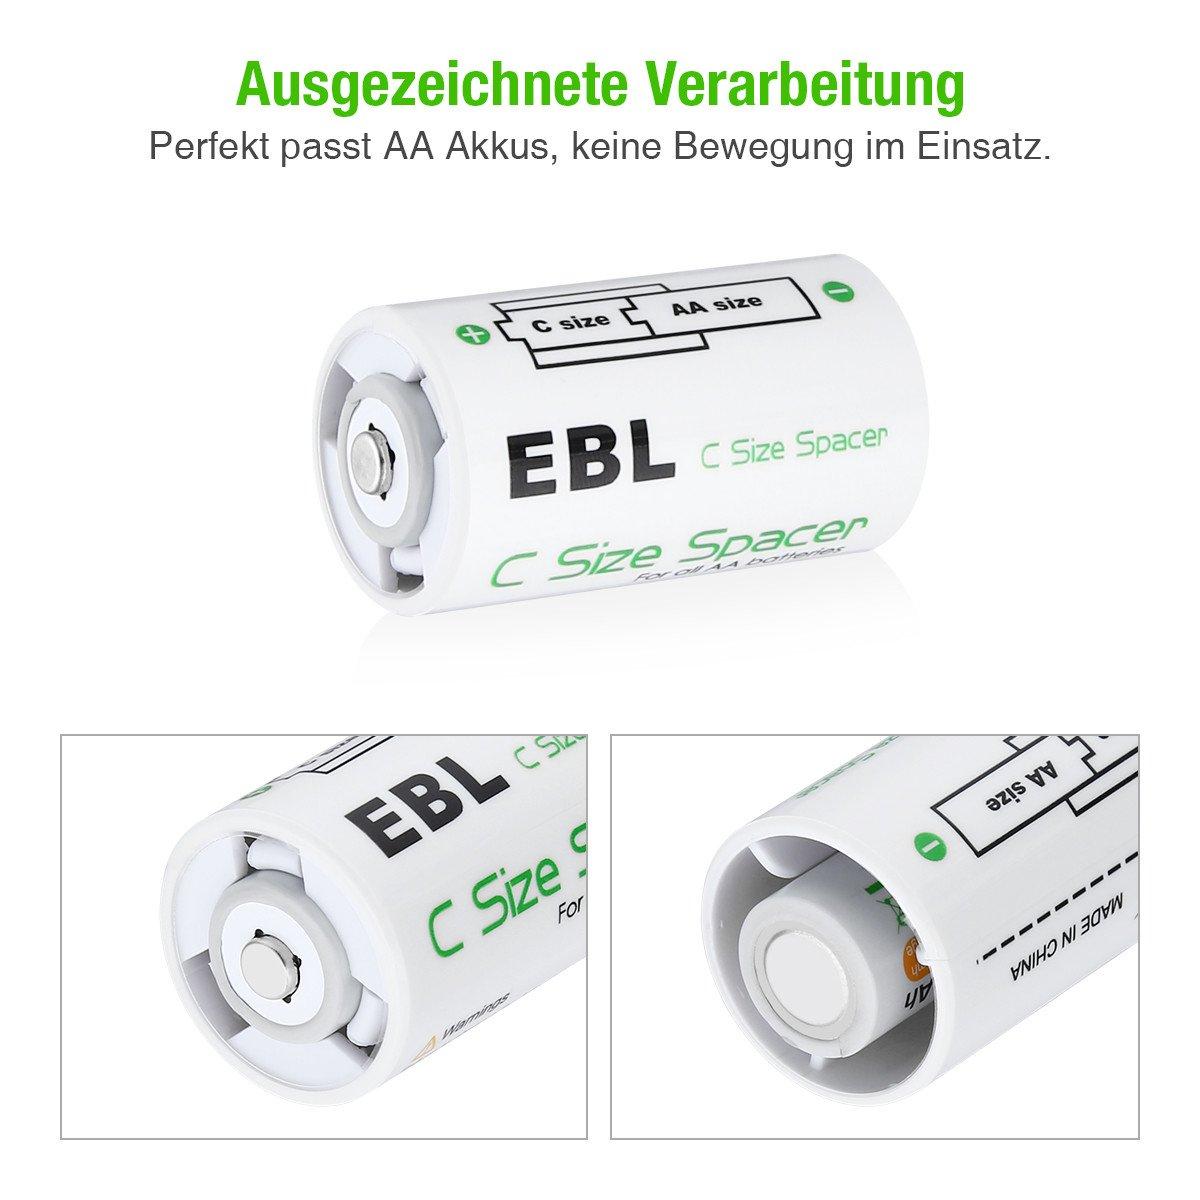 EBL 4 St/ück Mono D Akku Adapter f/ür AA Akku und Batterie